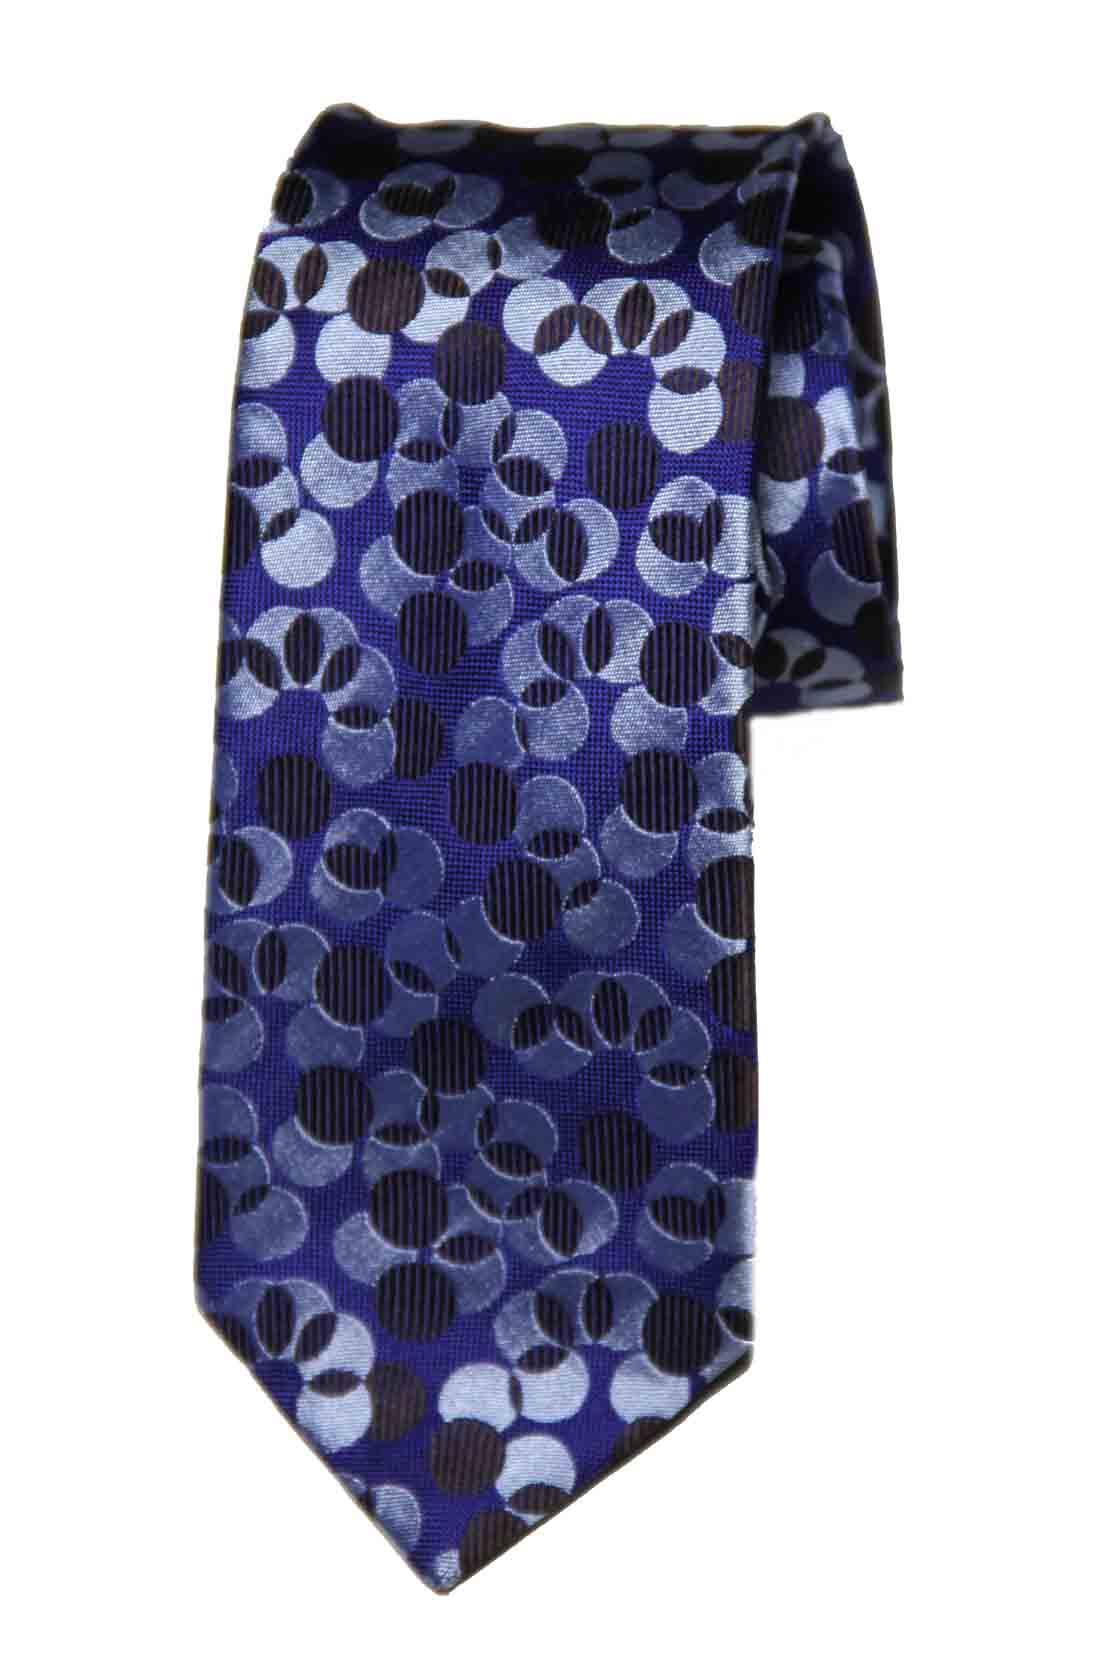 Thomas Pink Tie Silk Navy Blue Brown Lely Spot Men's